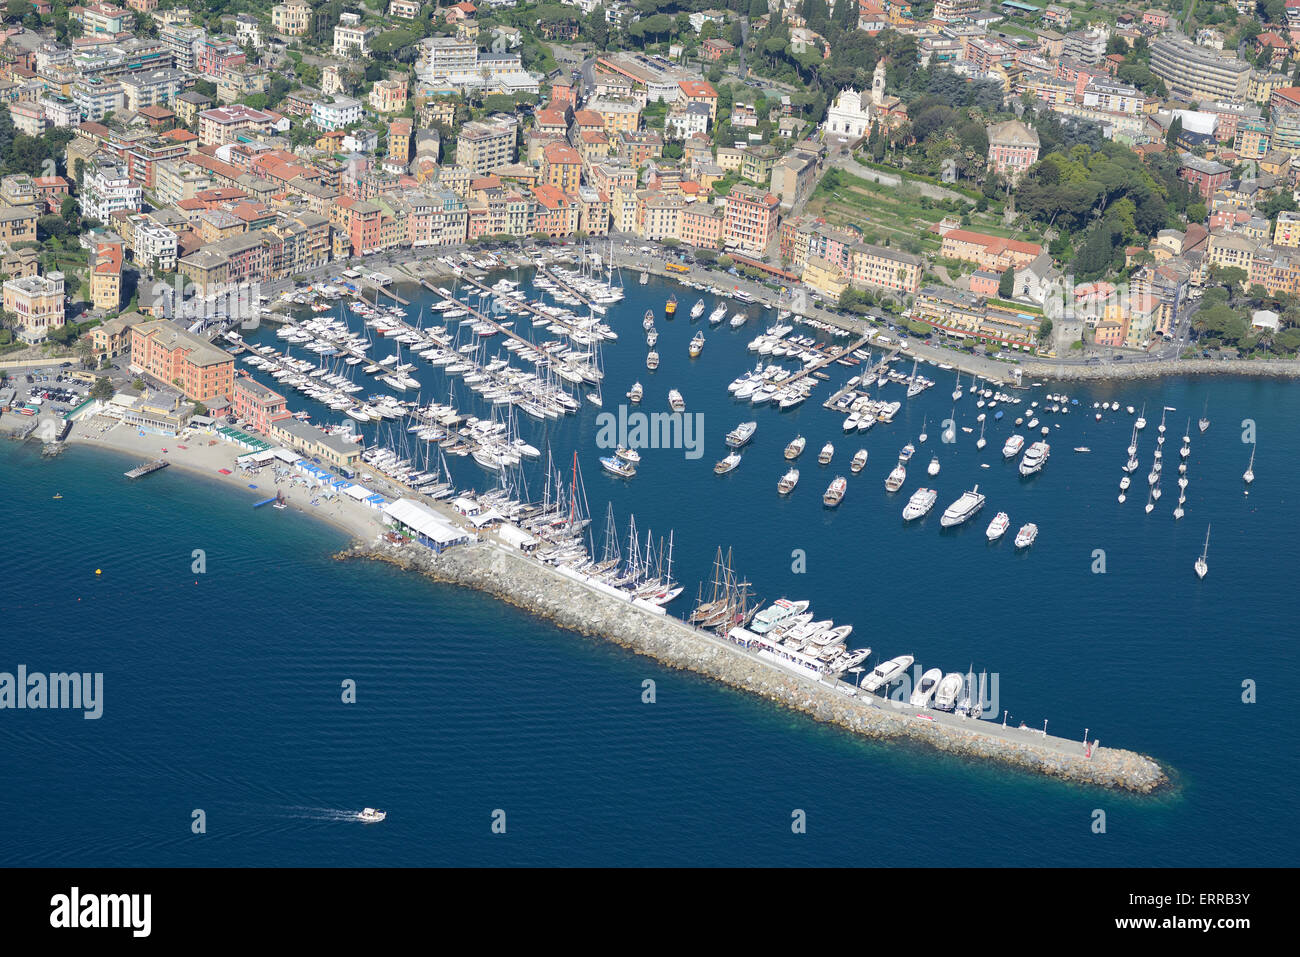 MARINA OF SANTA MARGHERITA LIGURE (aerial view). Province of Genoa, Liguria, Italy. - Stock Image